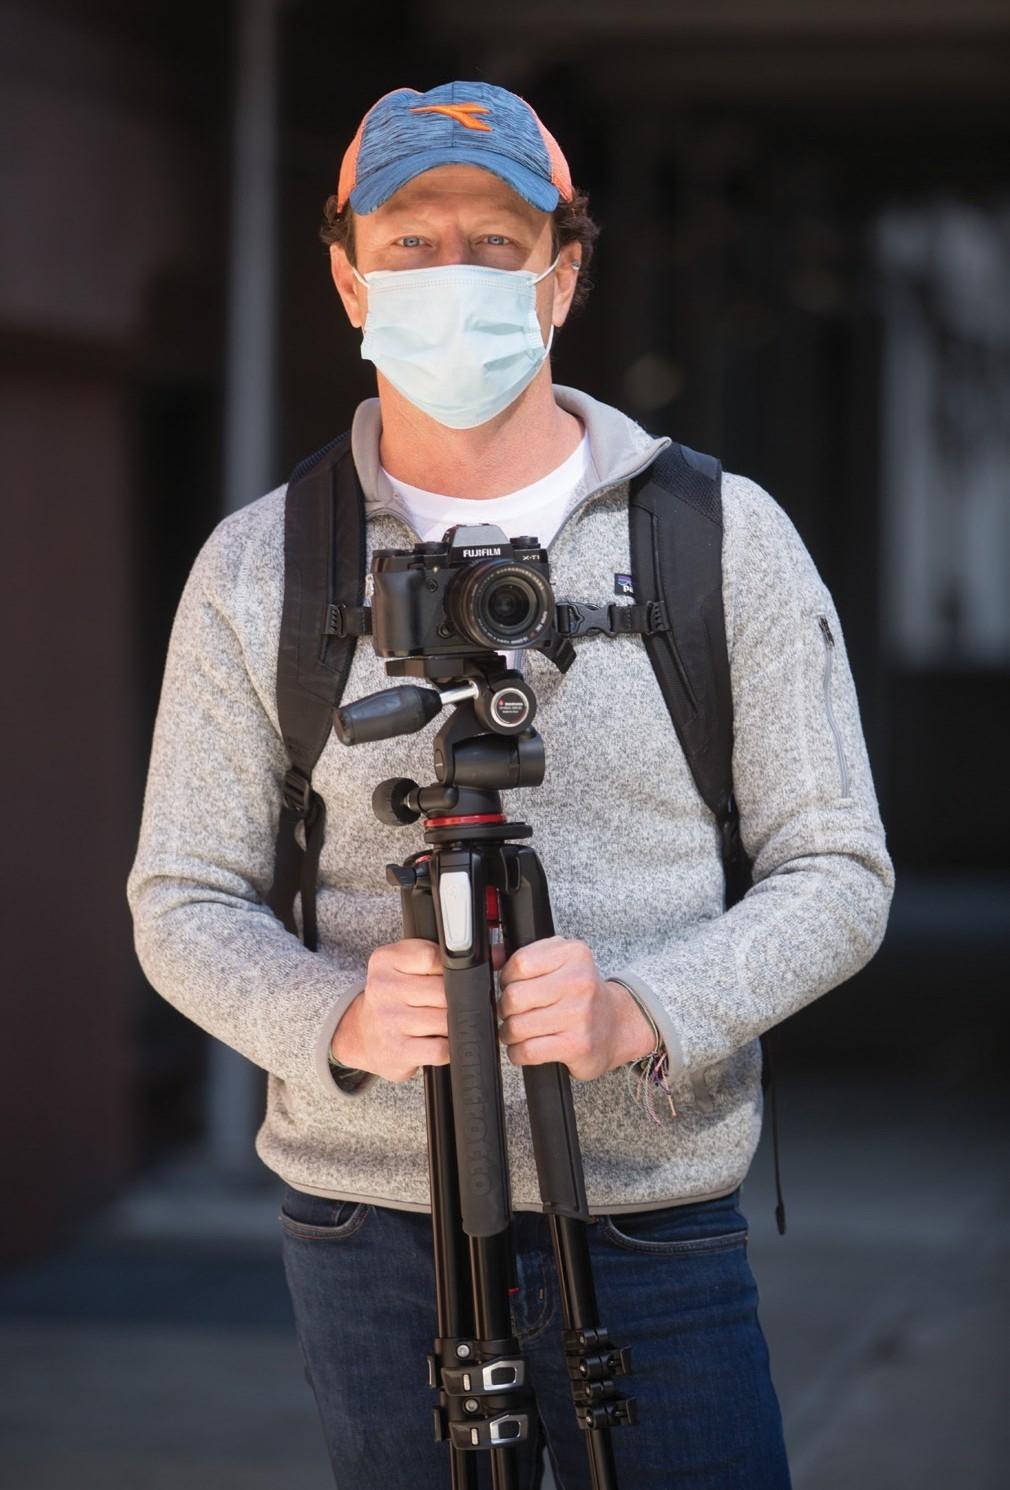 A man wearing a face mask holding a tripod